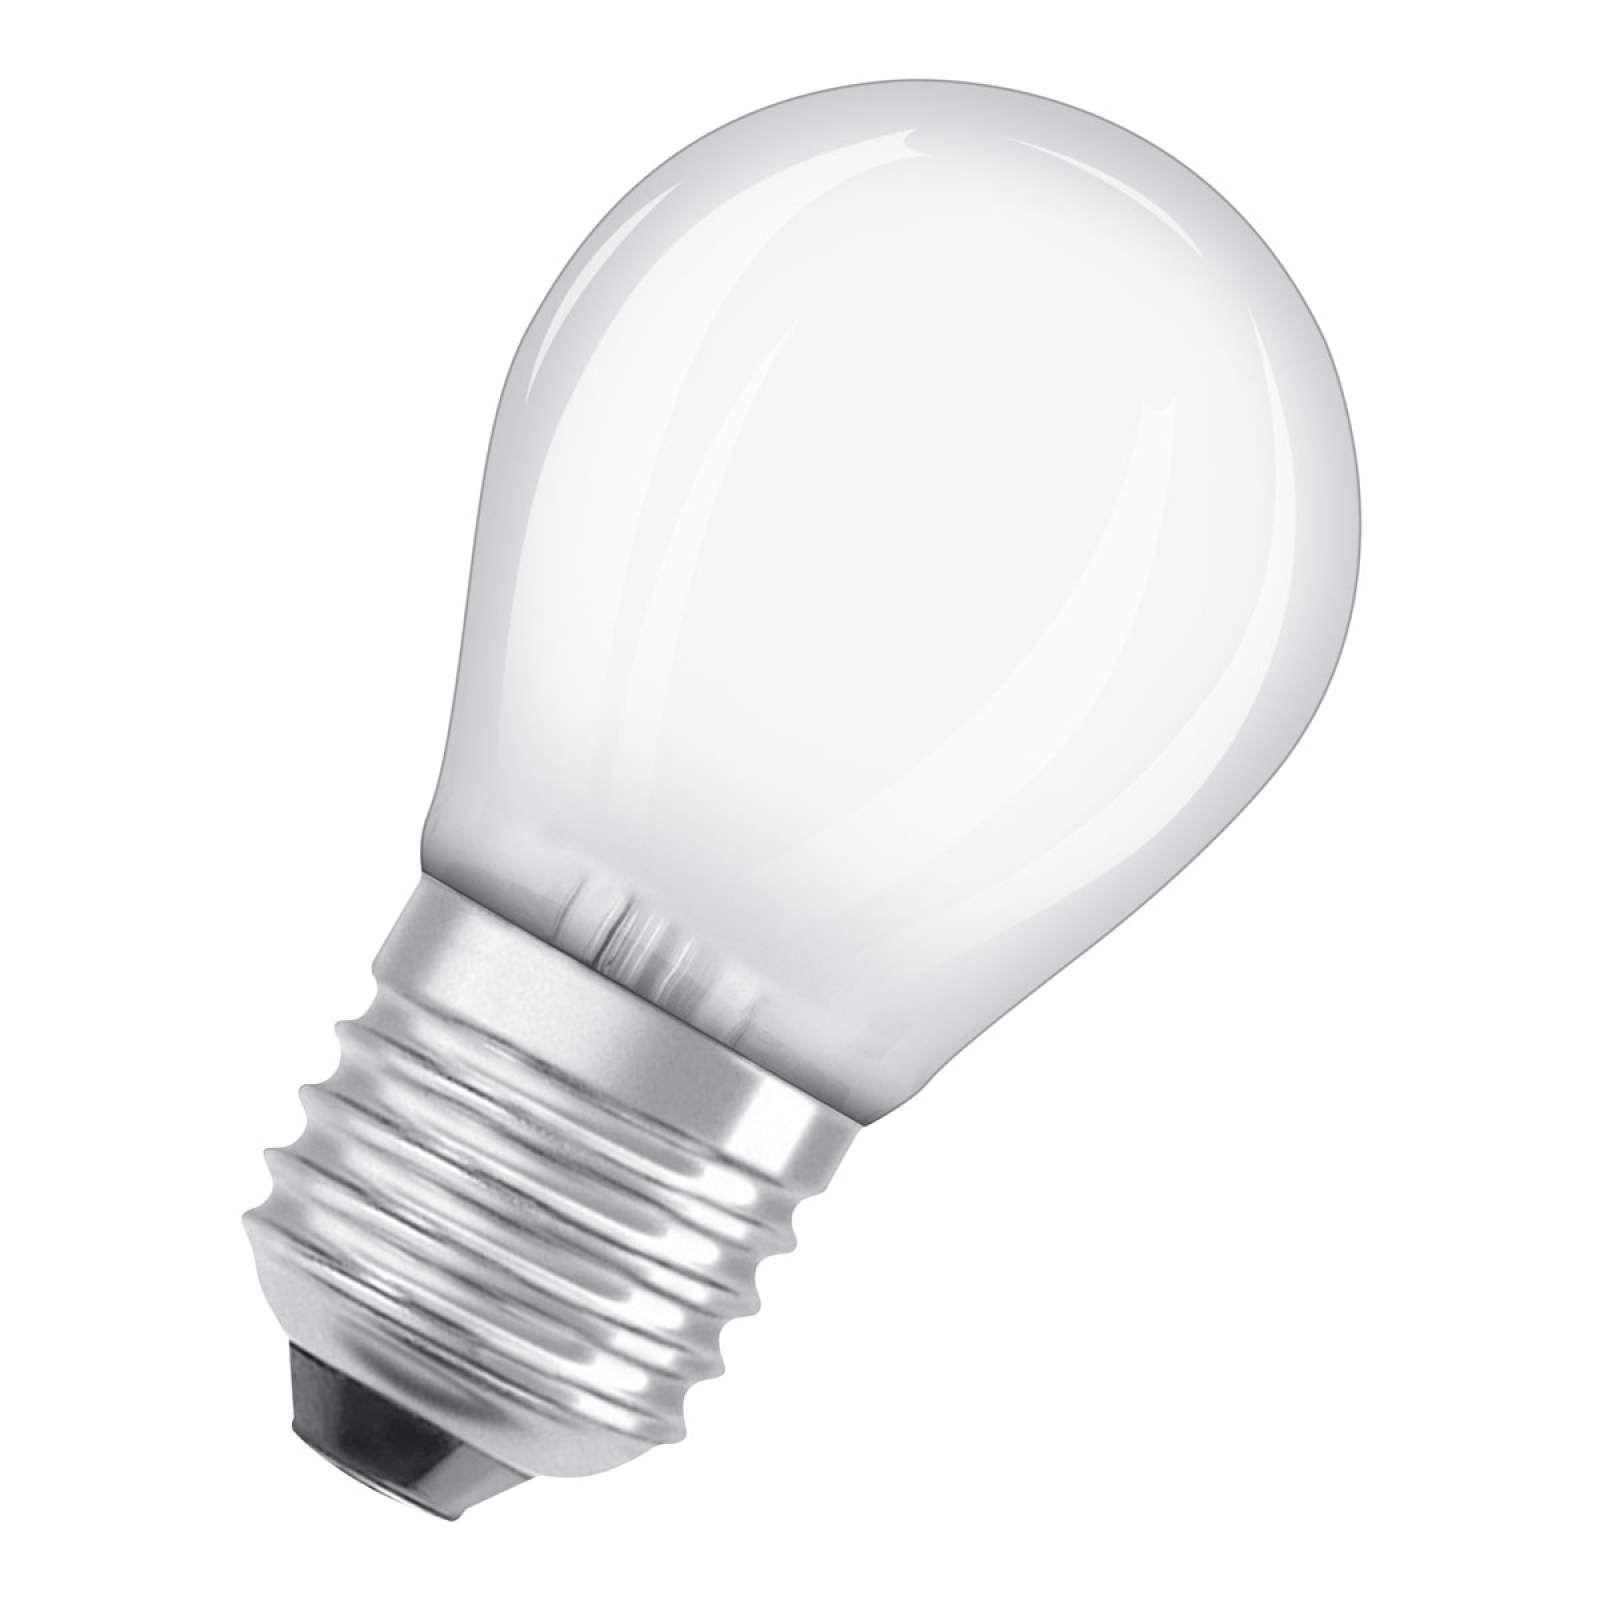 Osram Led Lampe E27 6w Classic P 2 700k Matt Led Lampe Led Und Osram